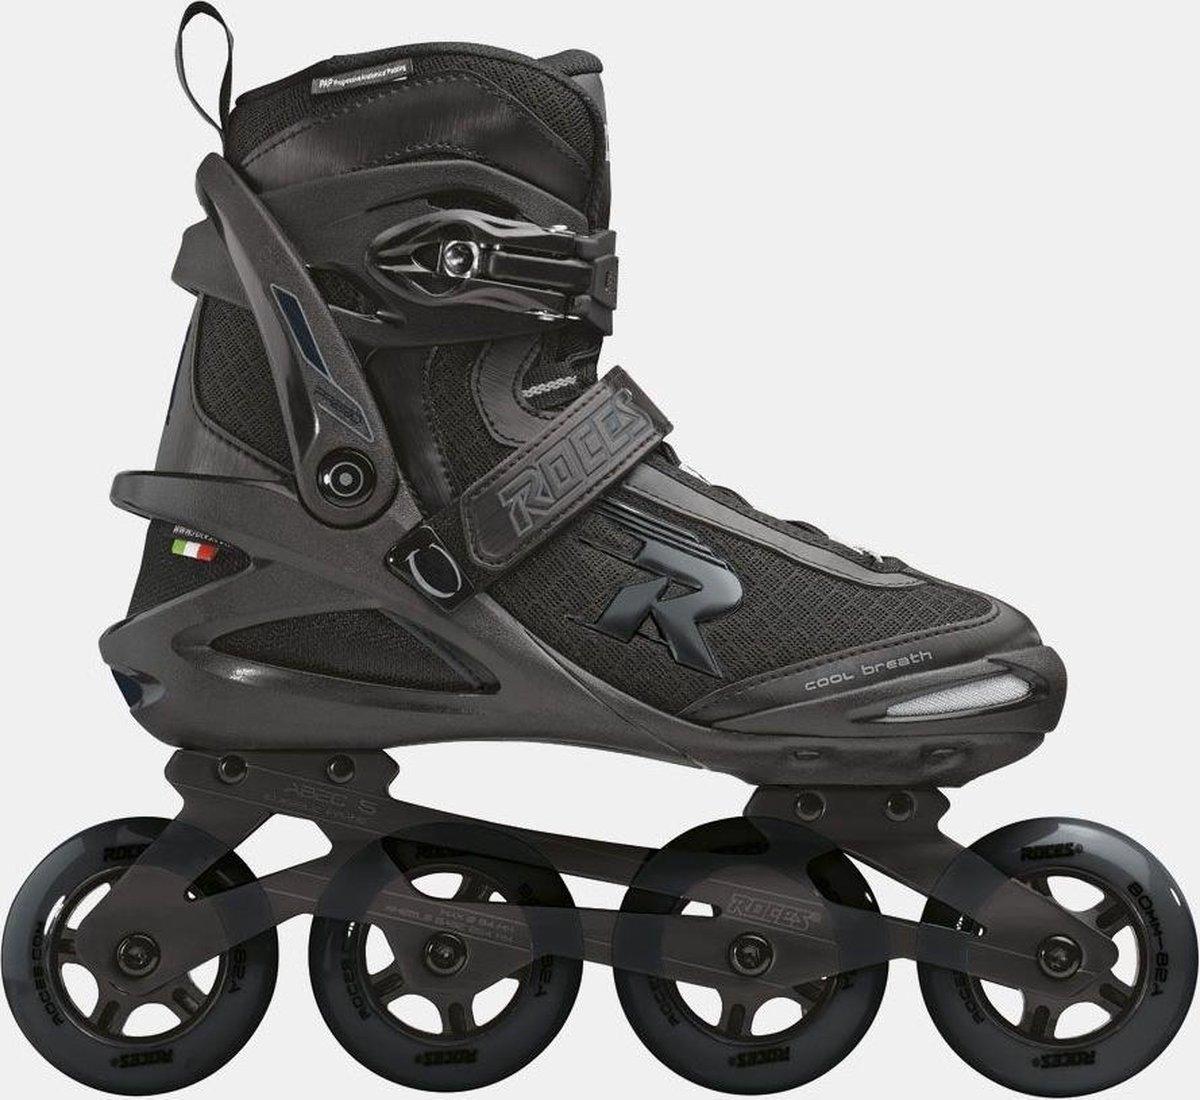 Roces Inline skates - Zwart - Prego Tif - Maat 38